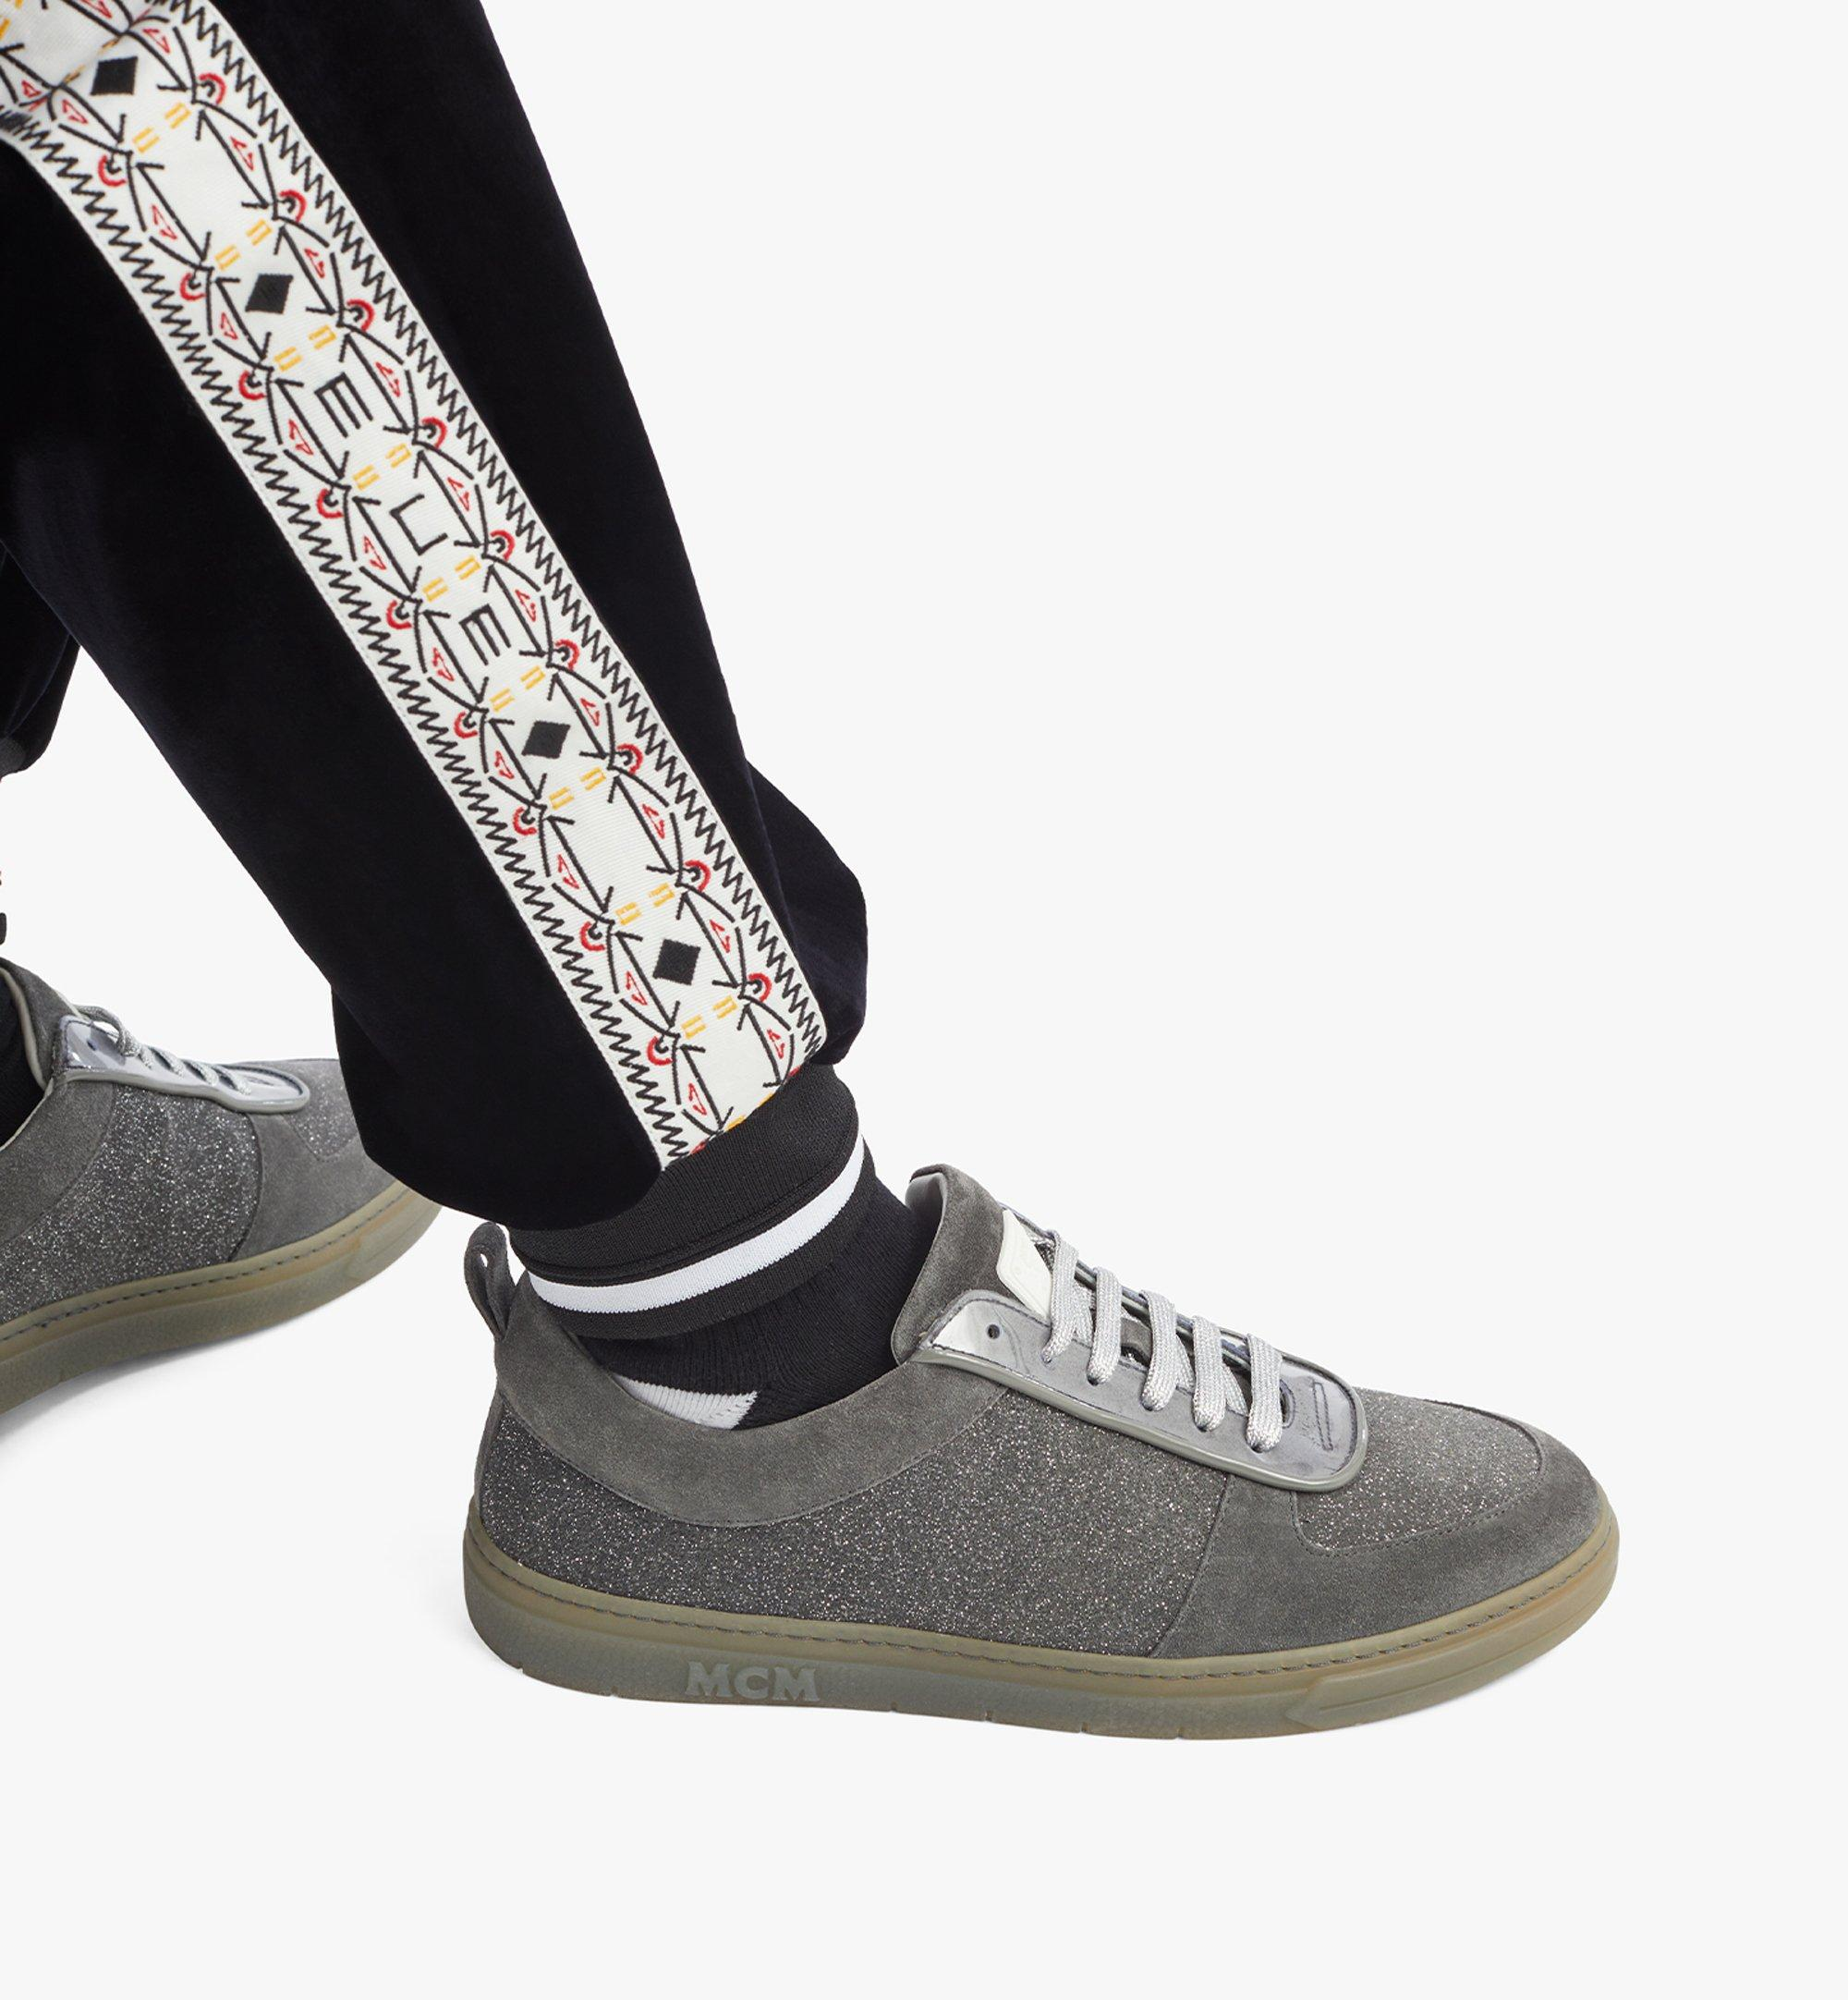 MCM Men's Terrain Lo Sneakers in Multi-Suede Leather Grey MEXBSMM06EO041 Alternate View 2